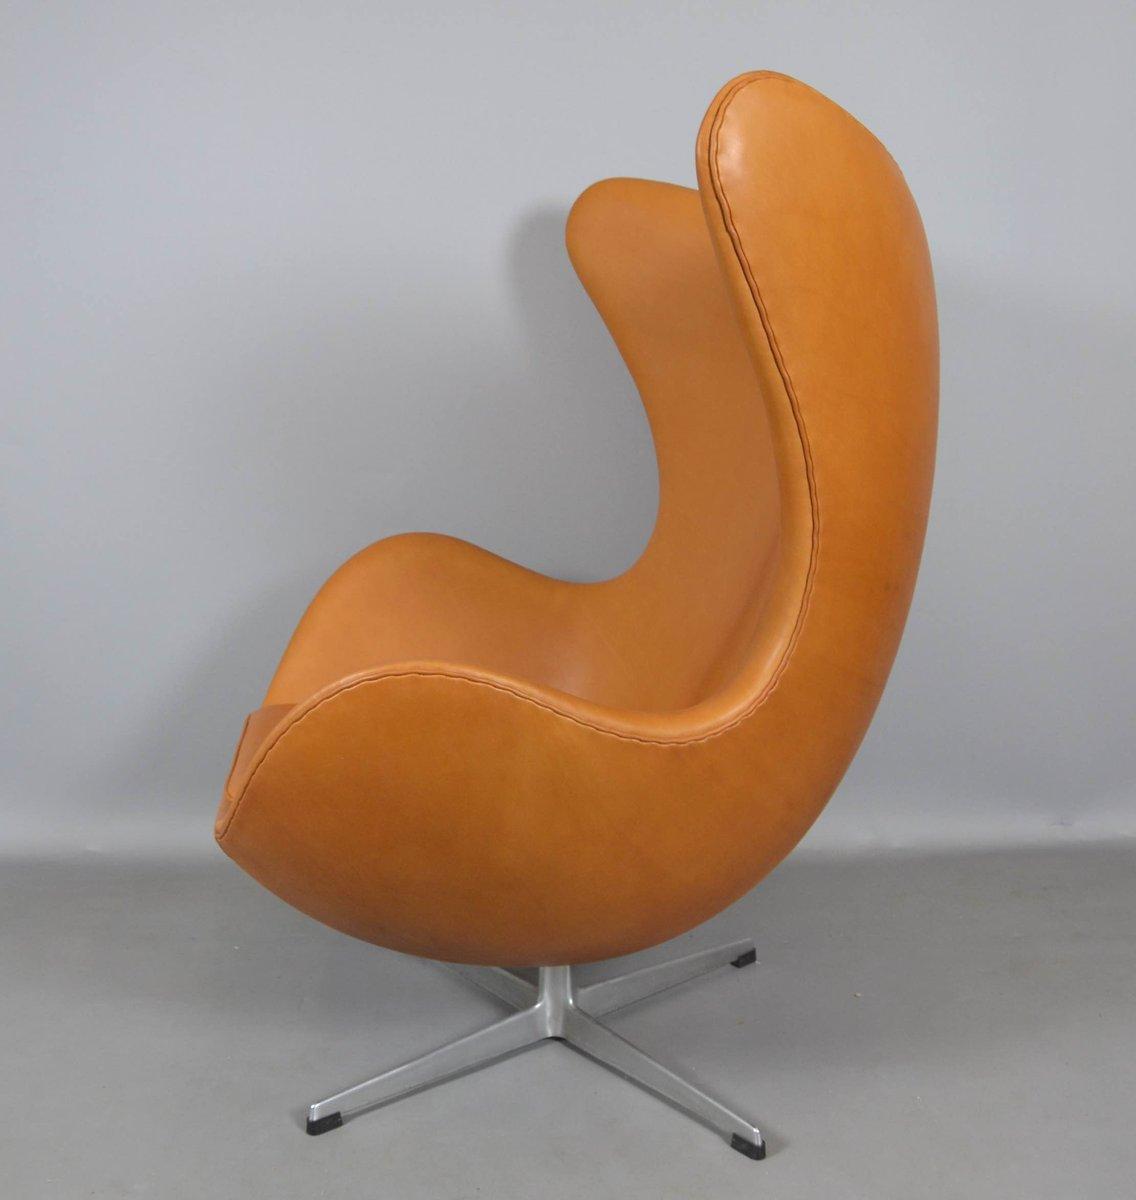 leather egg chair by arne jacobsen for fritz hansen 1970s. Black Bedroom Furniture Sets. Home Design Ideas